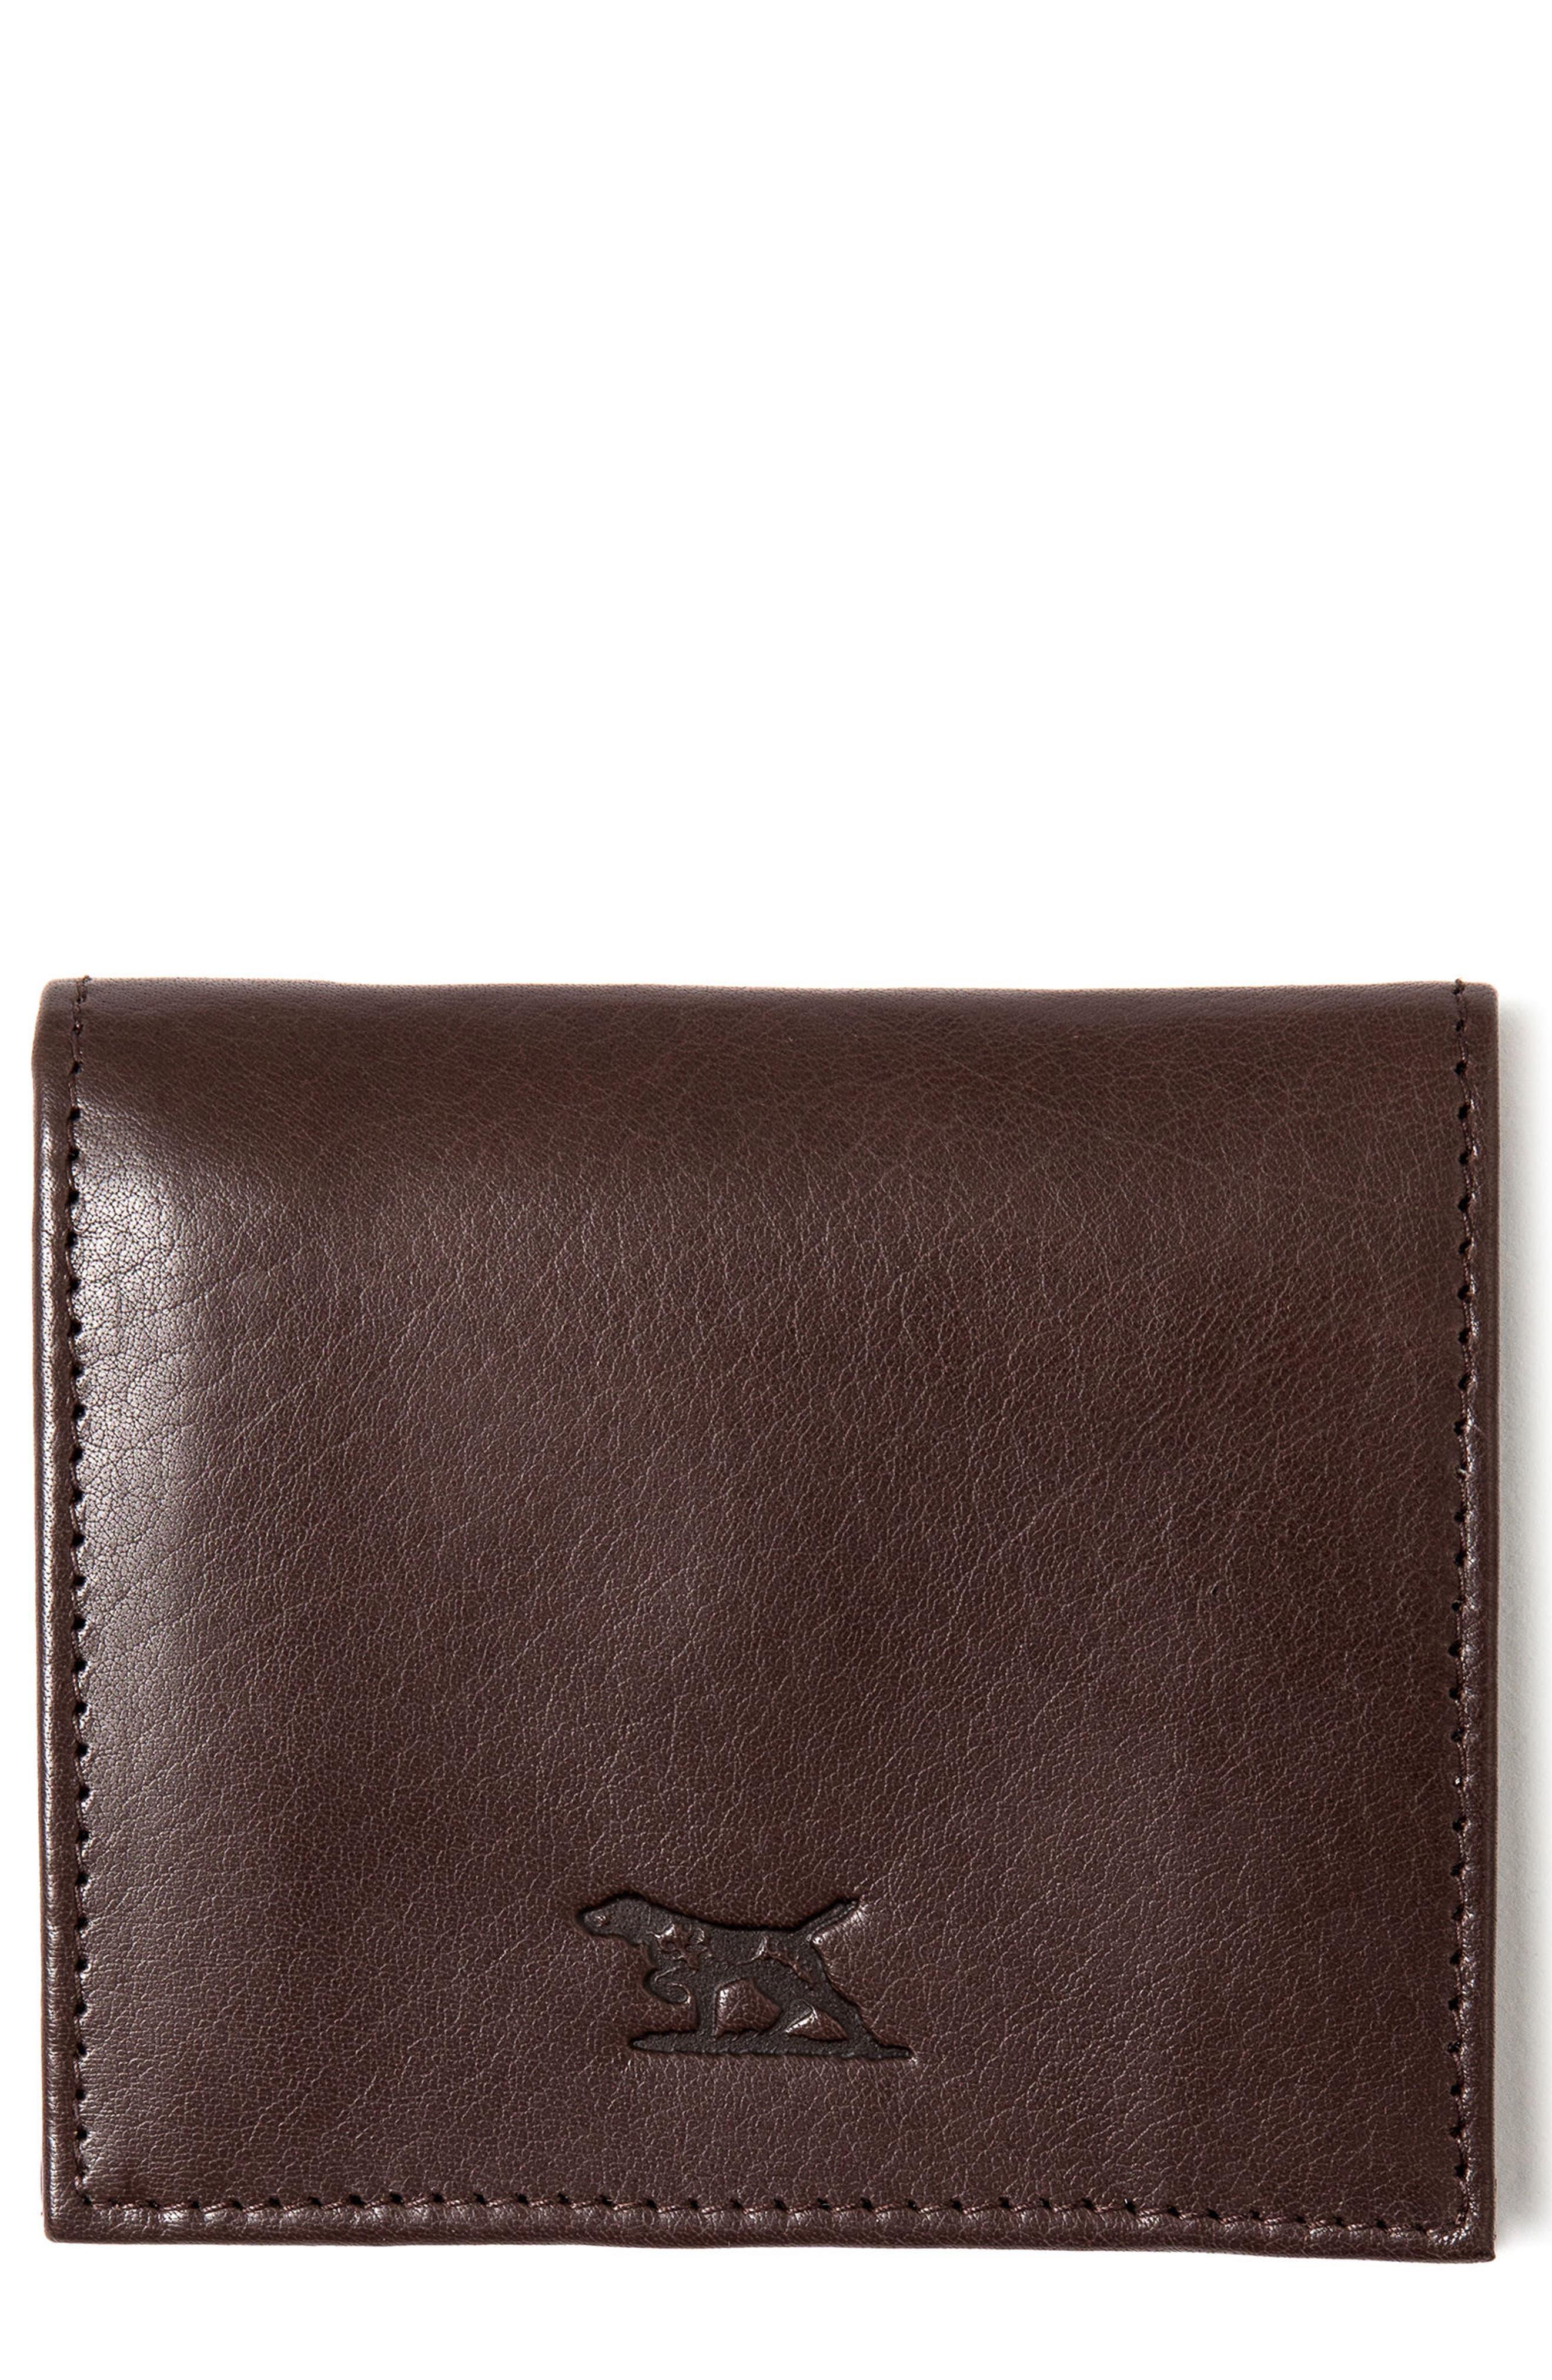 Alternate Image 1 Selected - Rodd & Gunn Highbank Station Leather Wallet